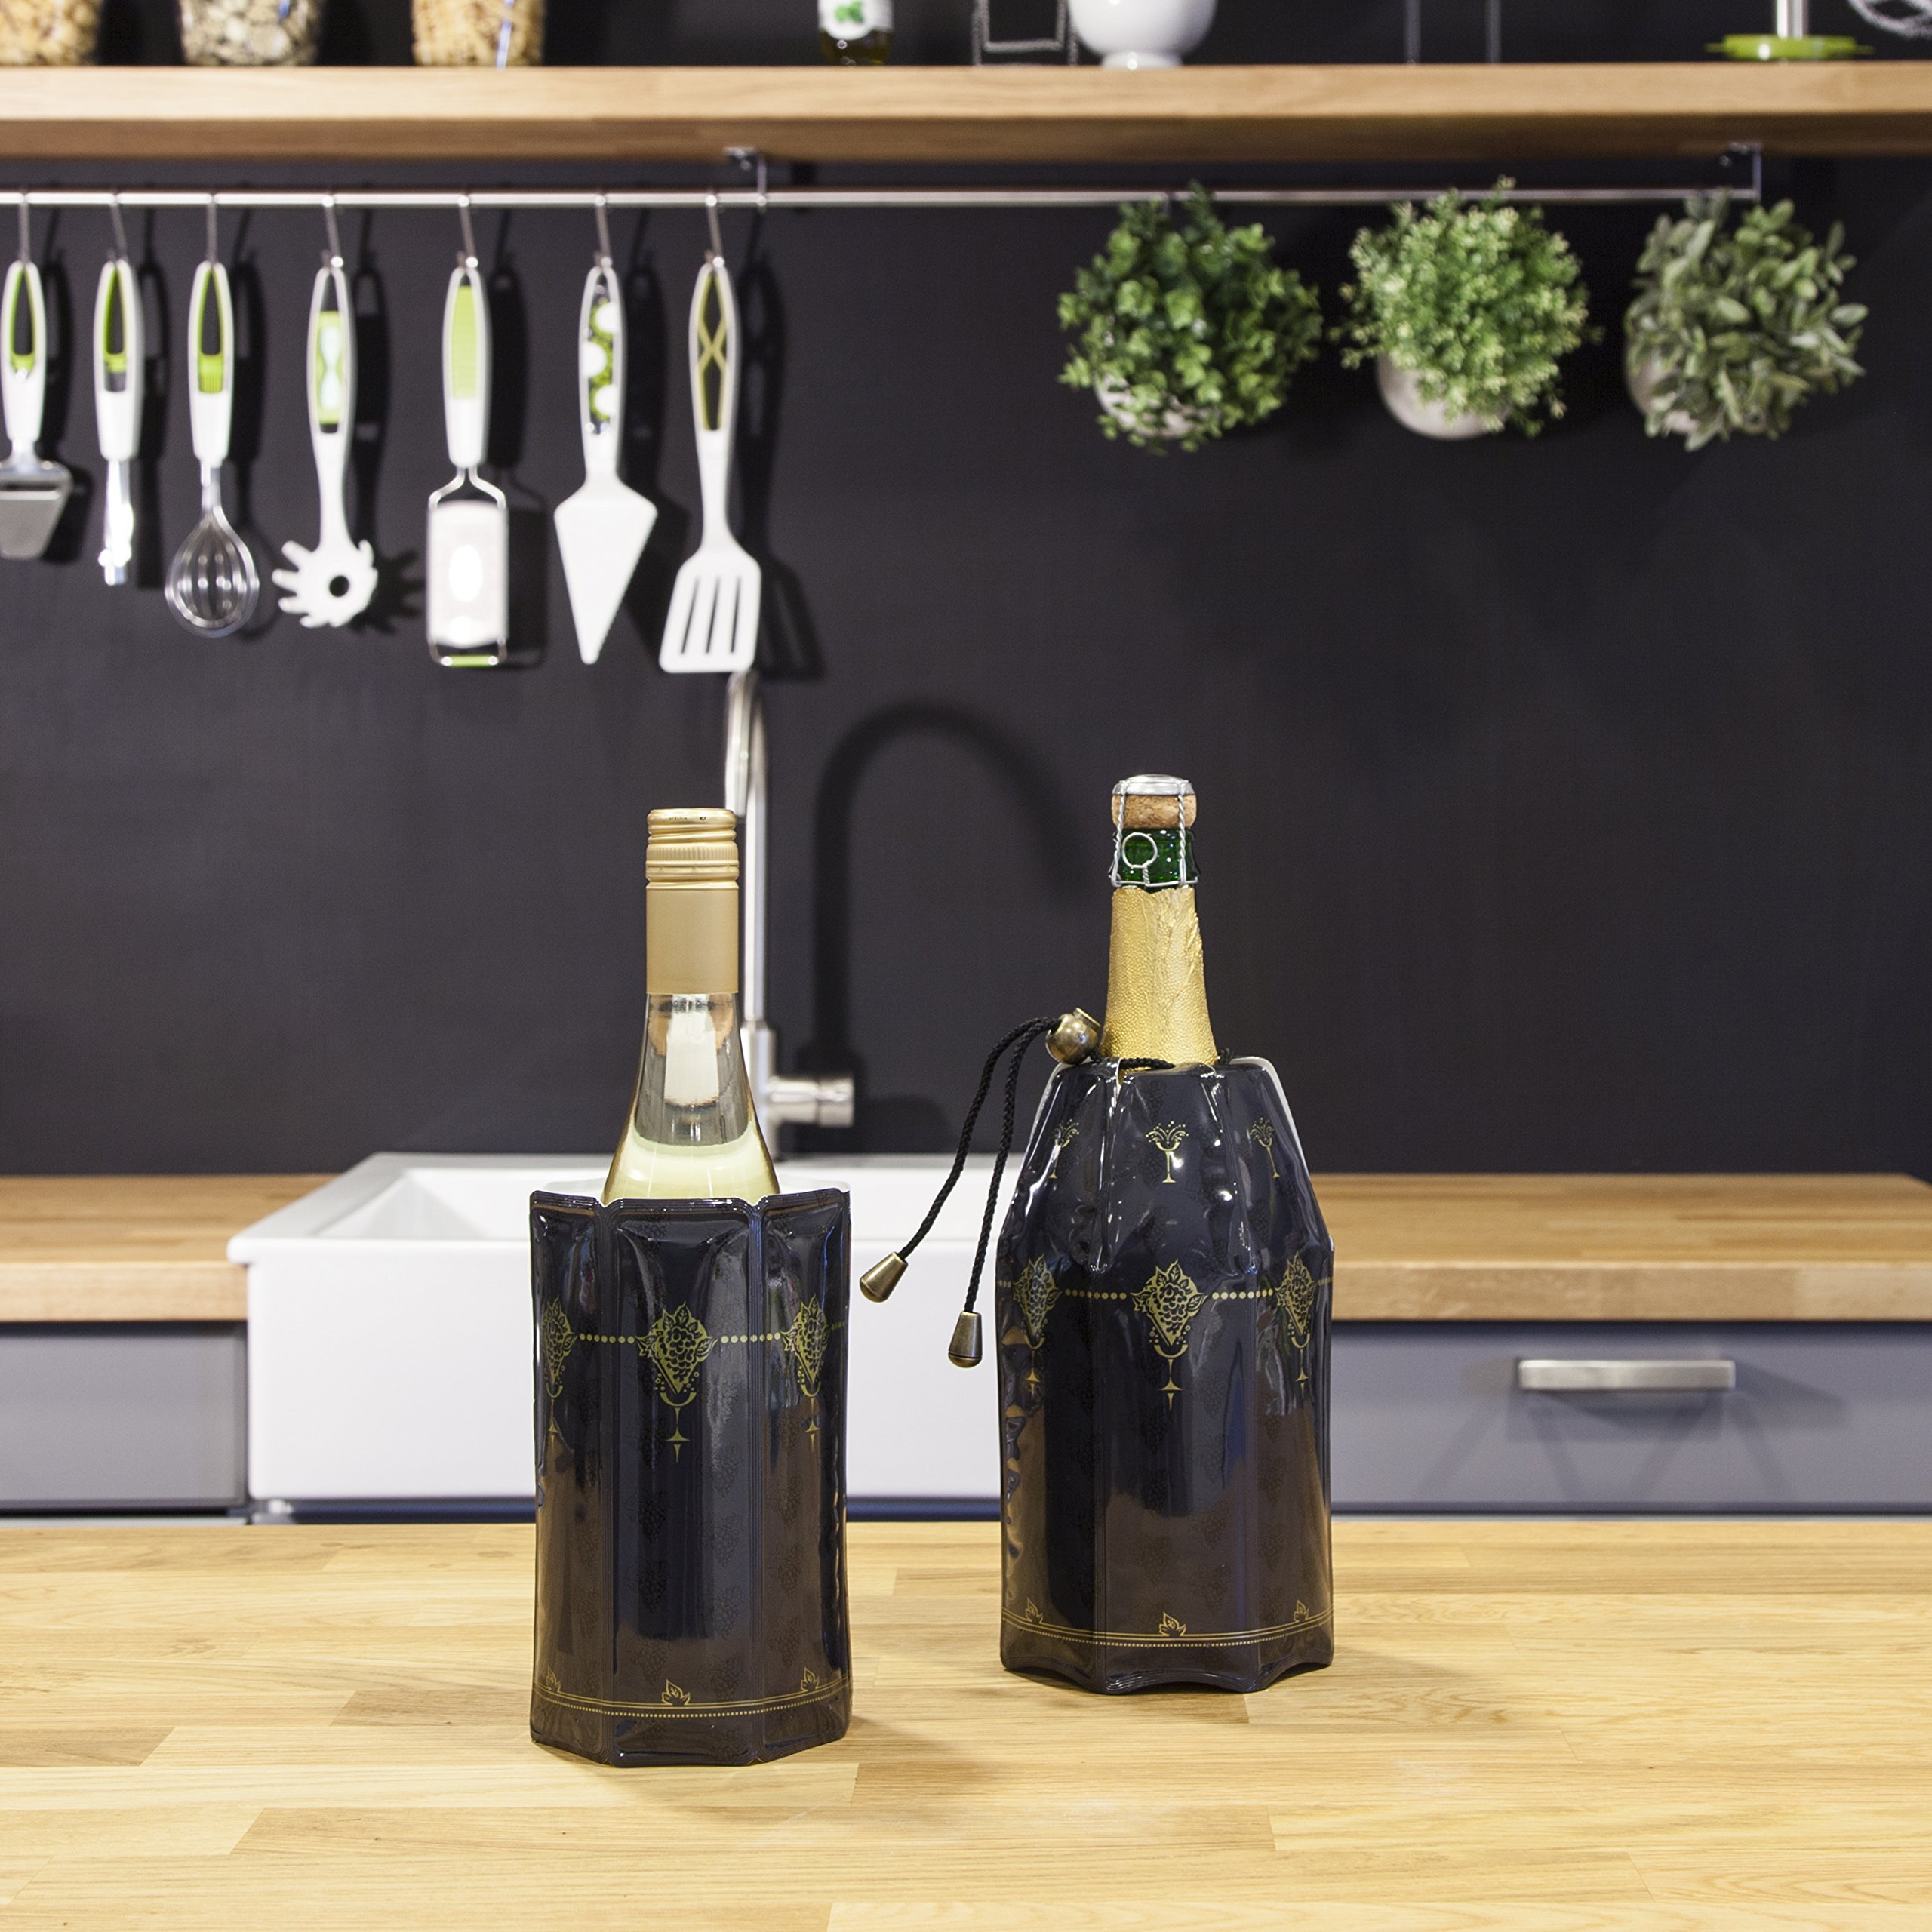 Vacuvin Rapid Ice Classic Wine & Champagne Cooler Plastic Black 22 cmx 29.8 cmx 3 cm